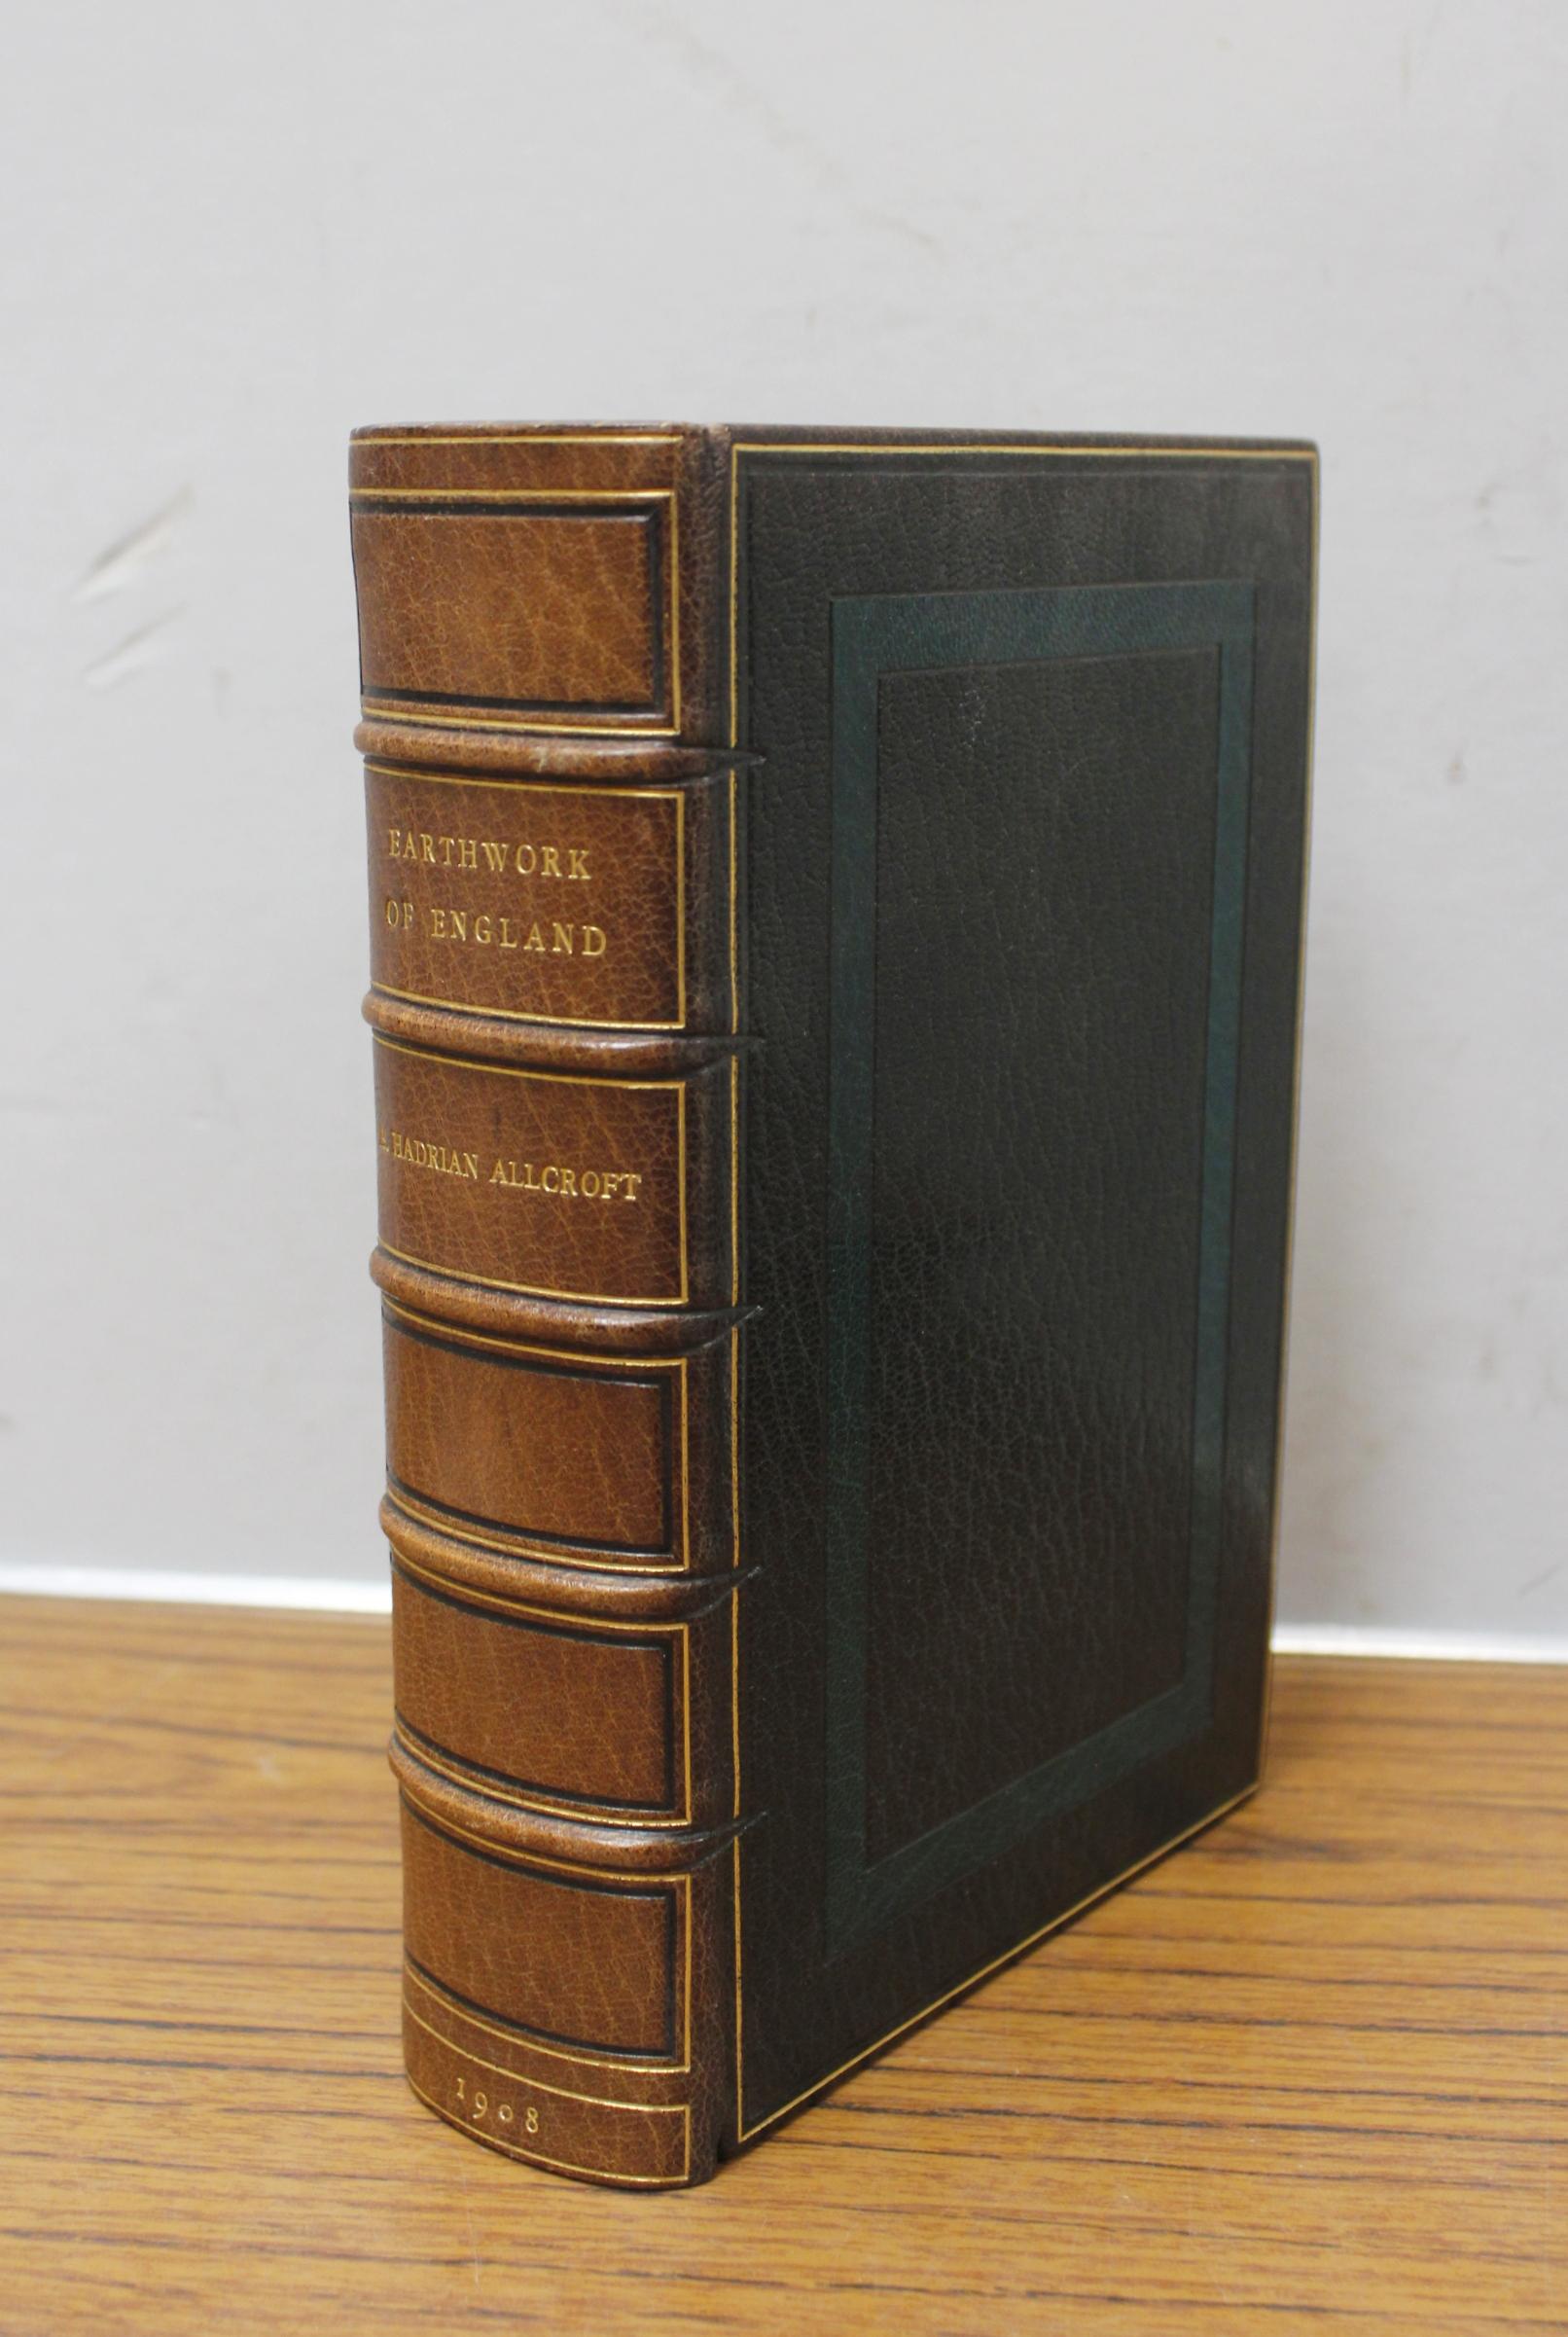 HADRIAN ALLCROFT A.Earthwork of England. Text illus. Fine panelled green morocco by Bumpus. 1908.